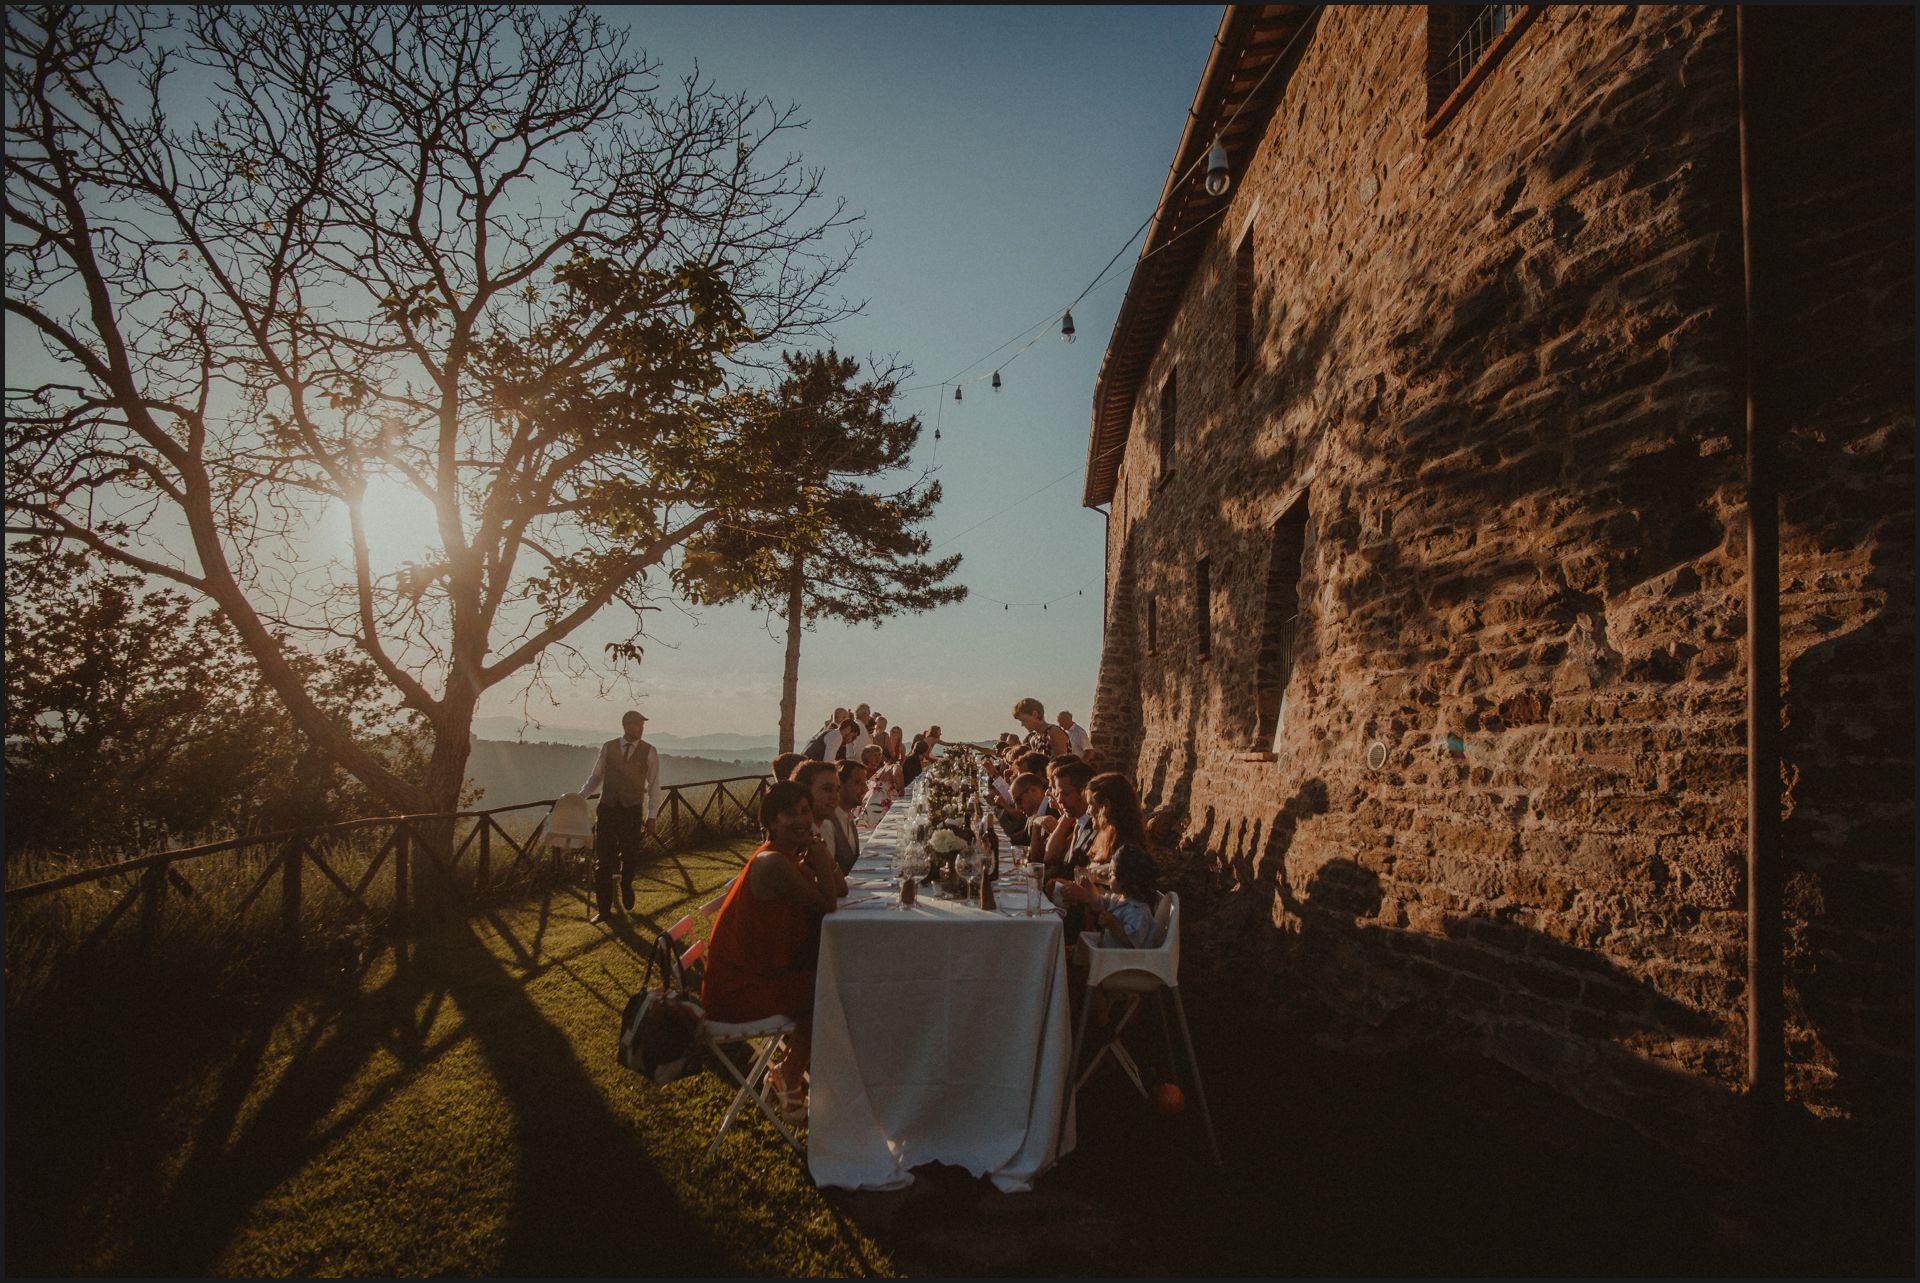 wedding, details, table set, menu, umbria, nikis resort, party